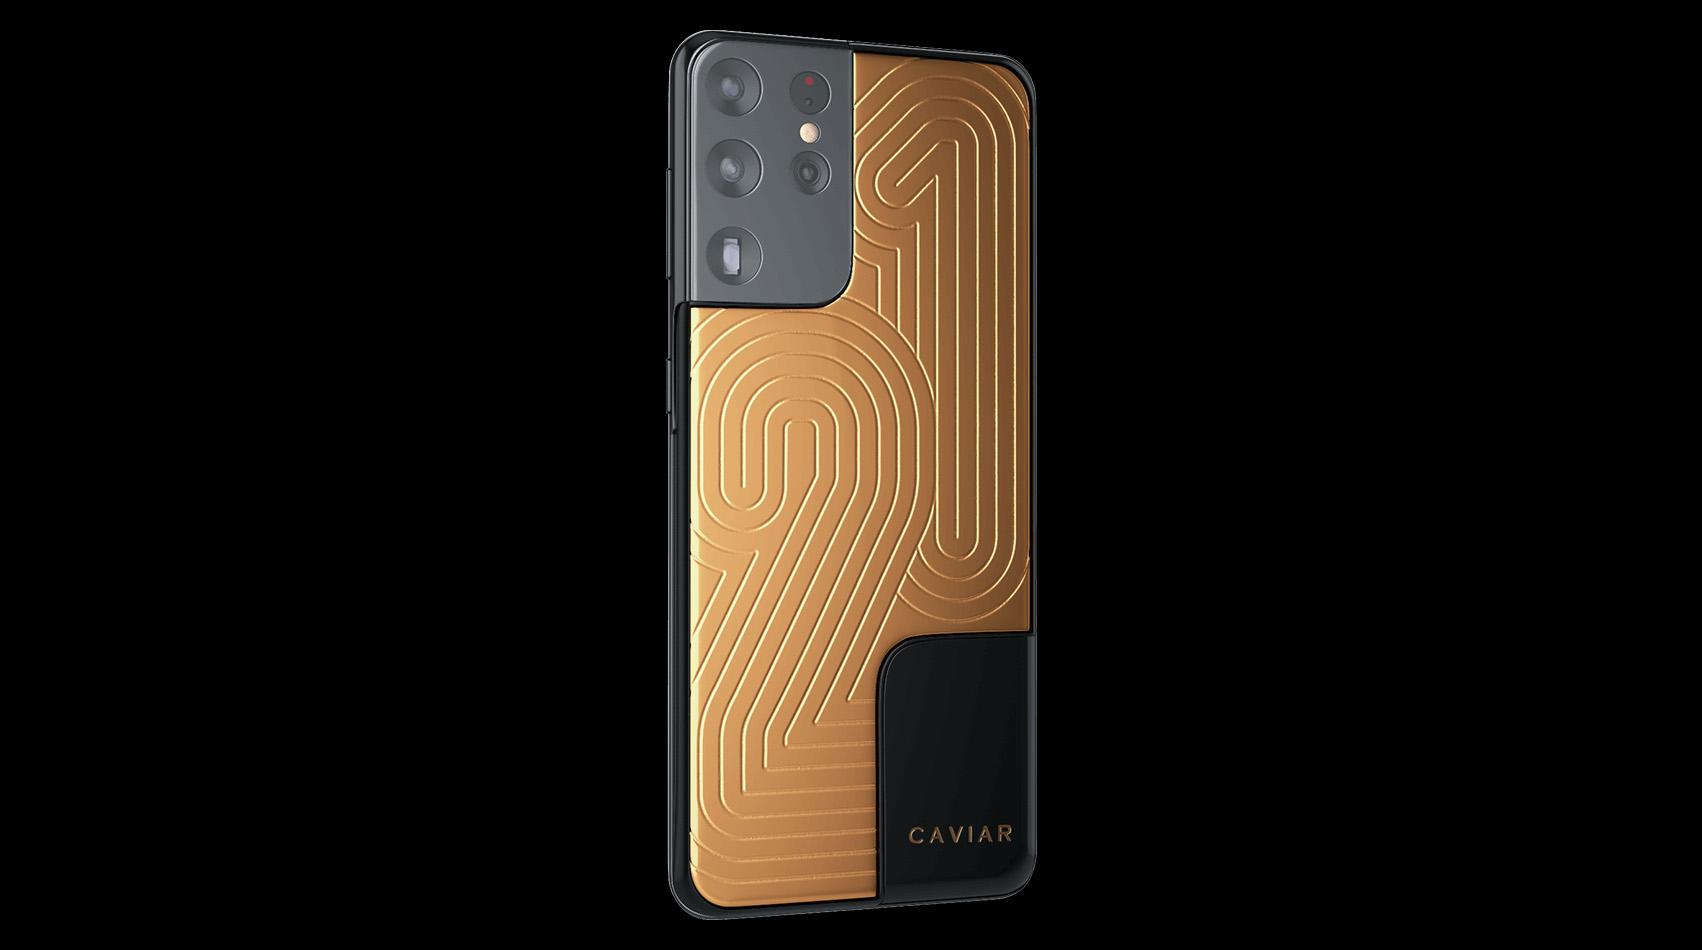 Dieses Samsung Galaxy S21 Ultra kostet knapp 70.000 Euro